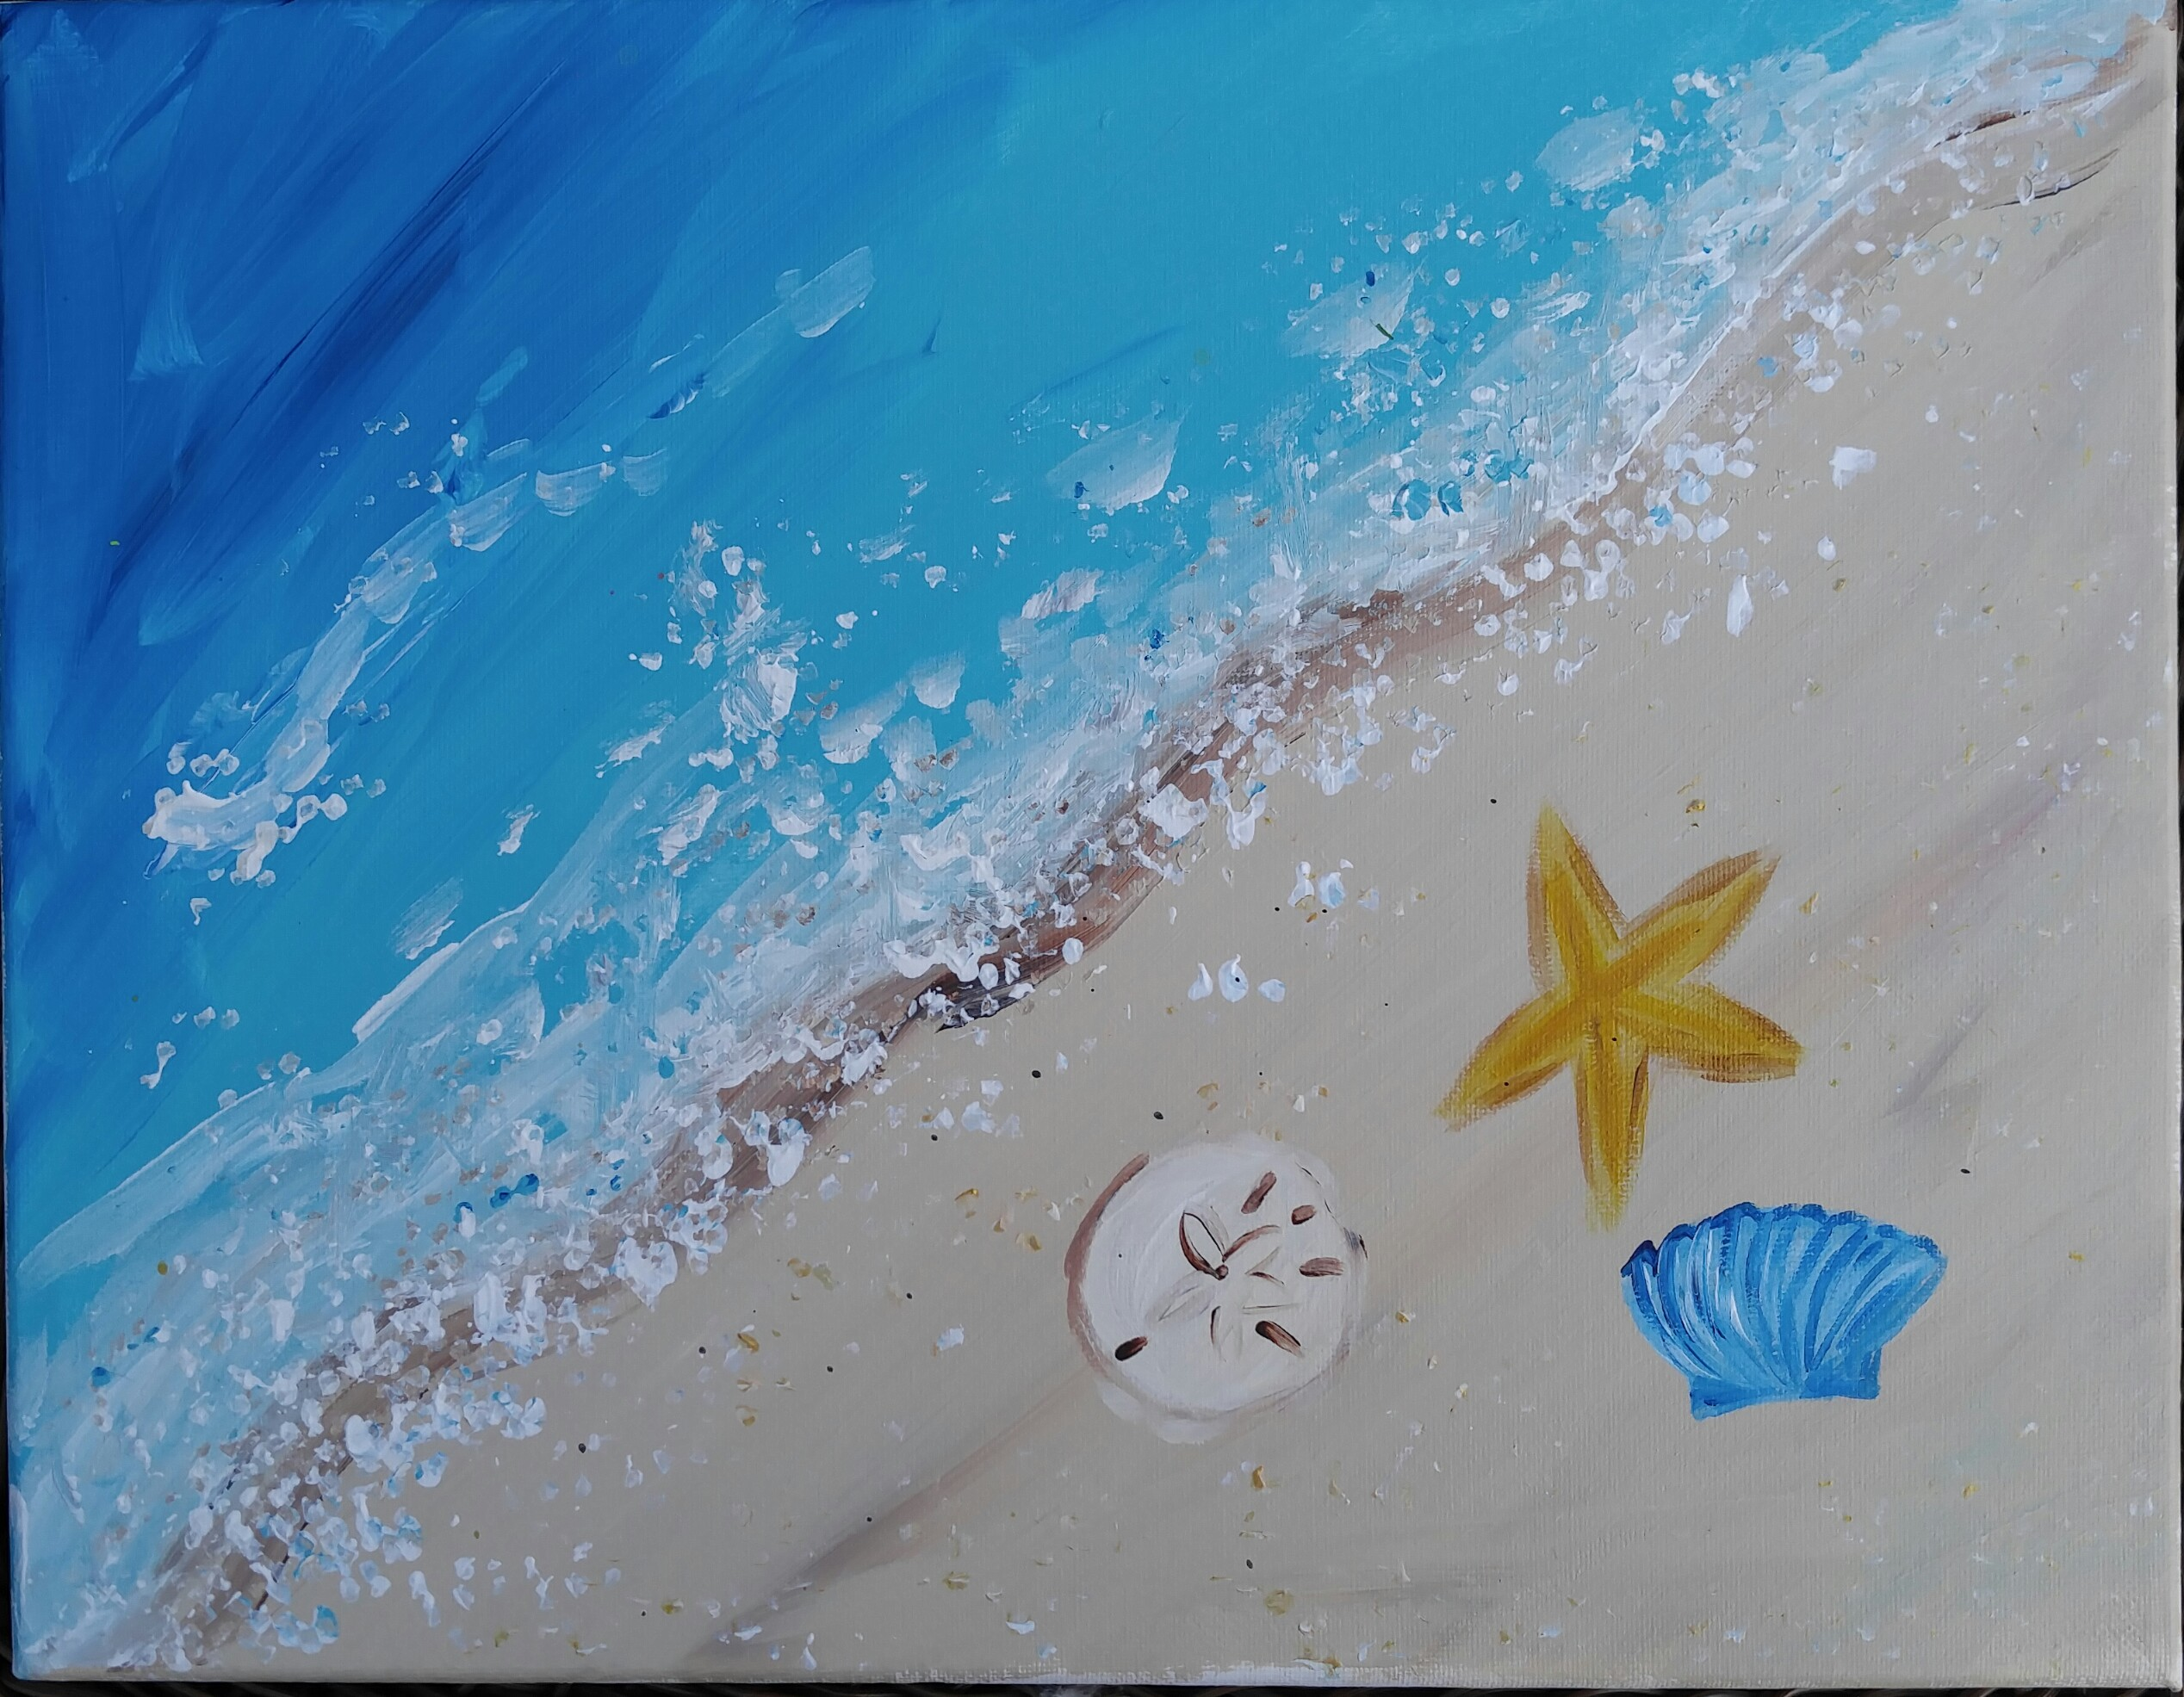 BEACH AND SEASHELLS